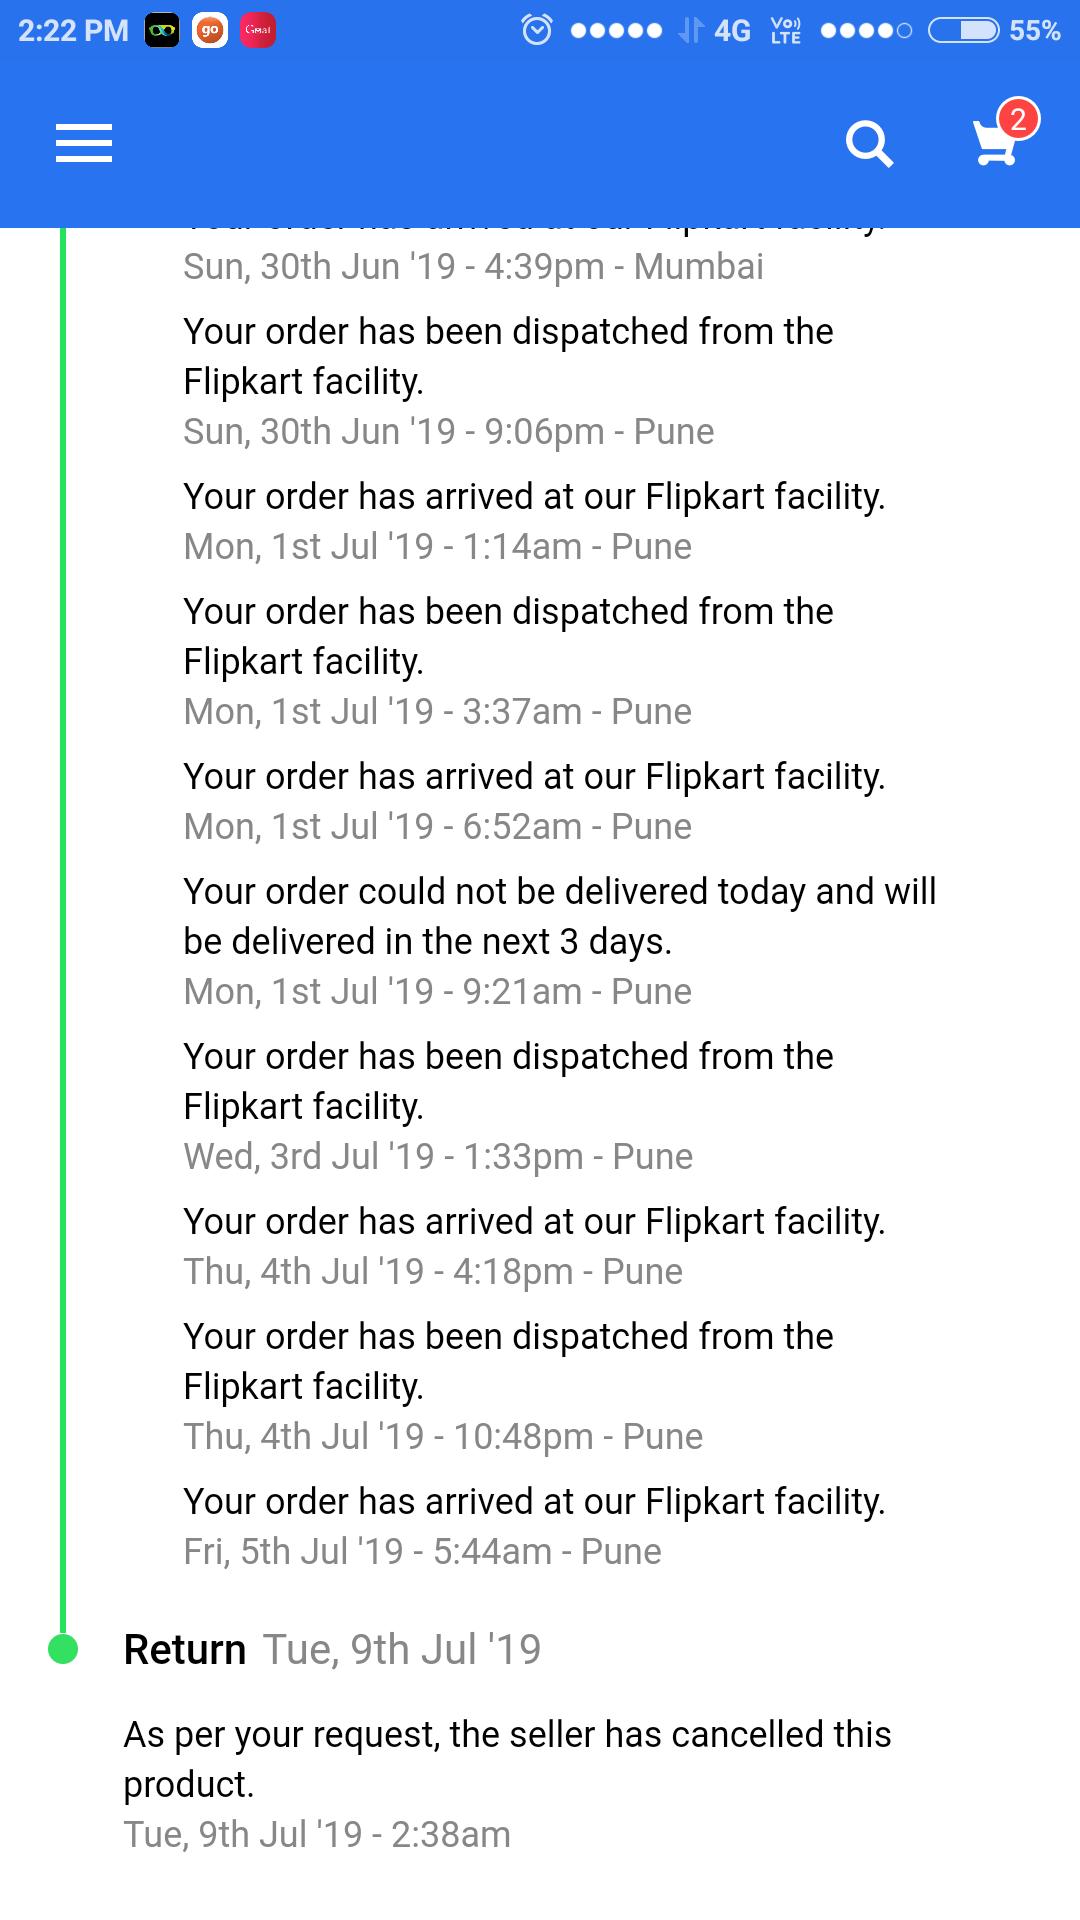 Screenshot_2019-07-09-14-22-49-294_com.flipkart.android_09072019022327.png